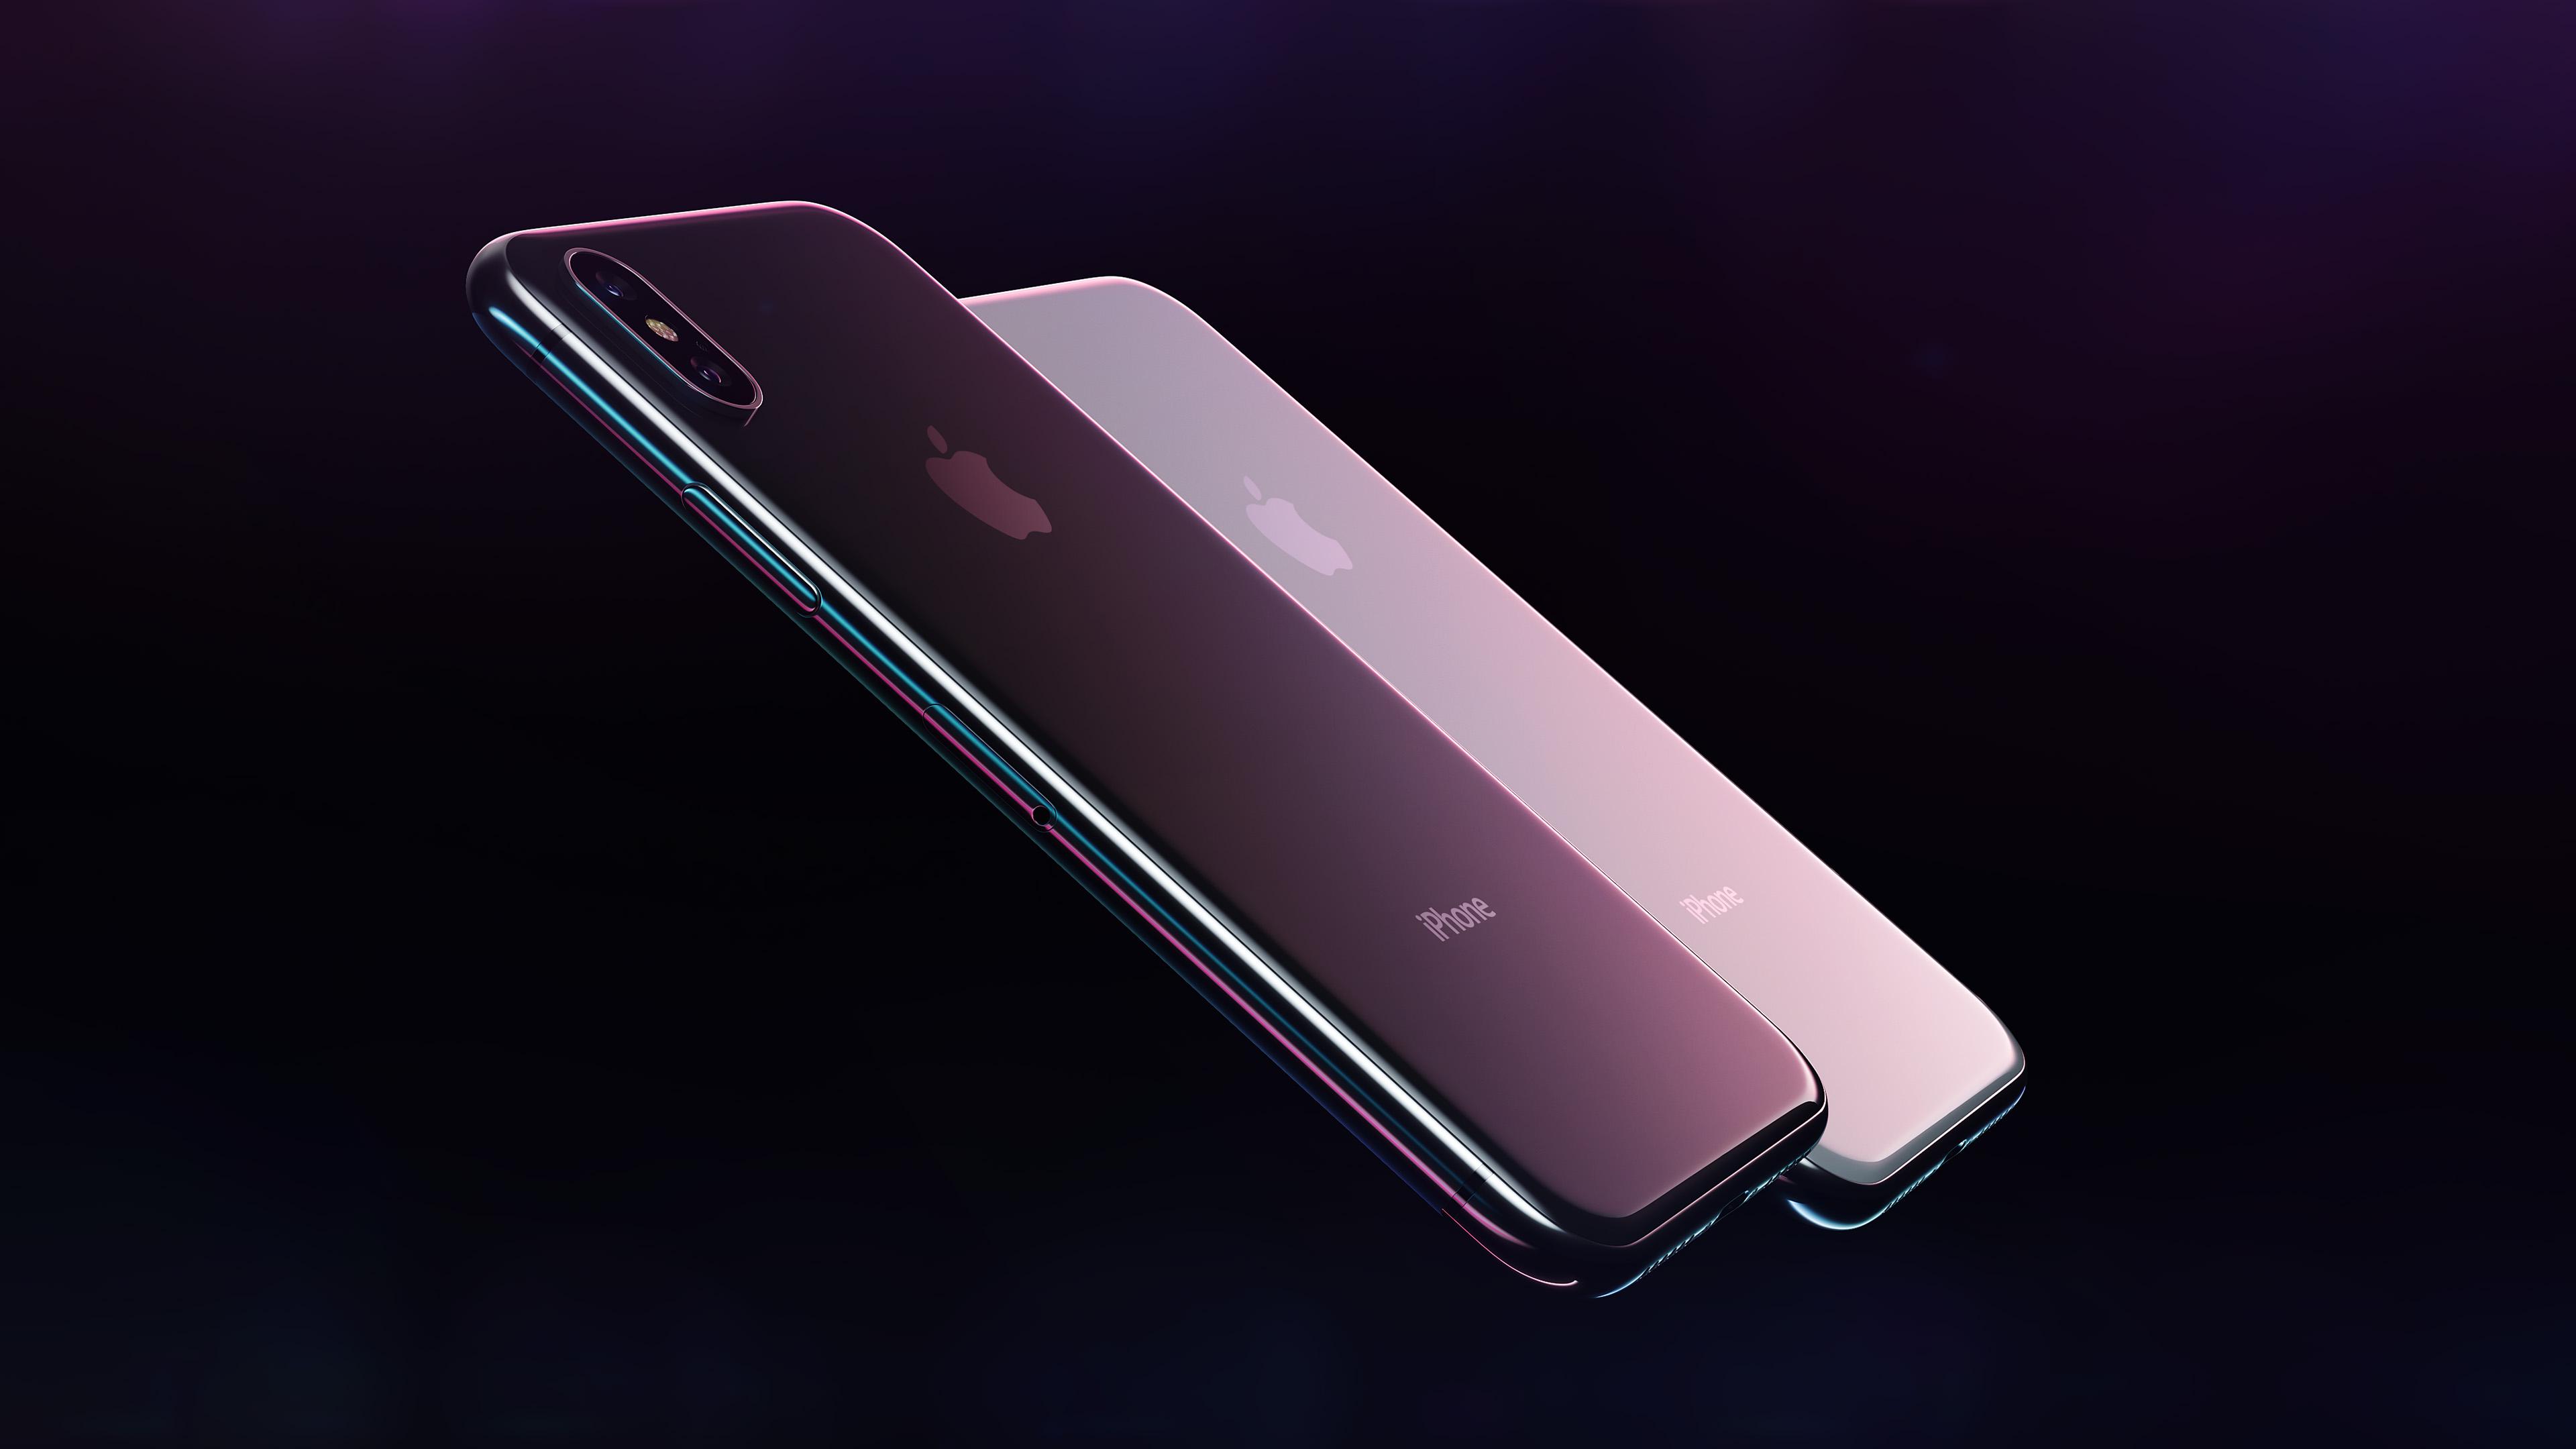 iphone x, смартфон, айфон 10, hi tech обои, 4k